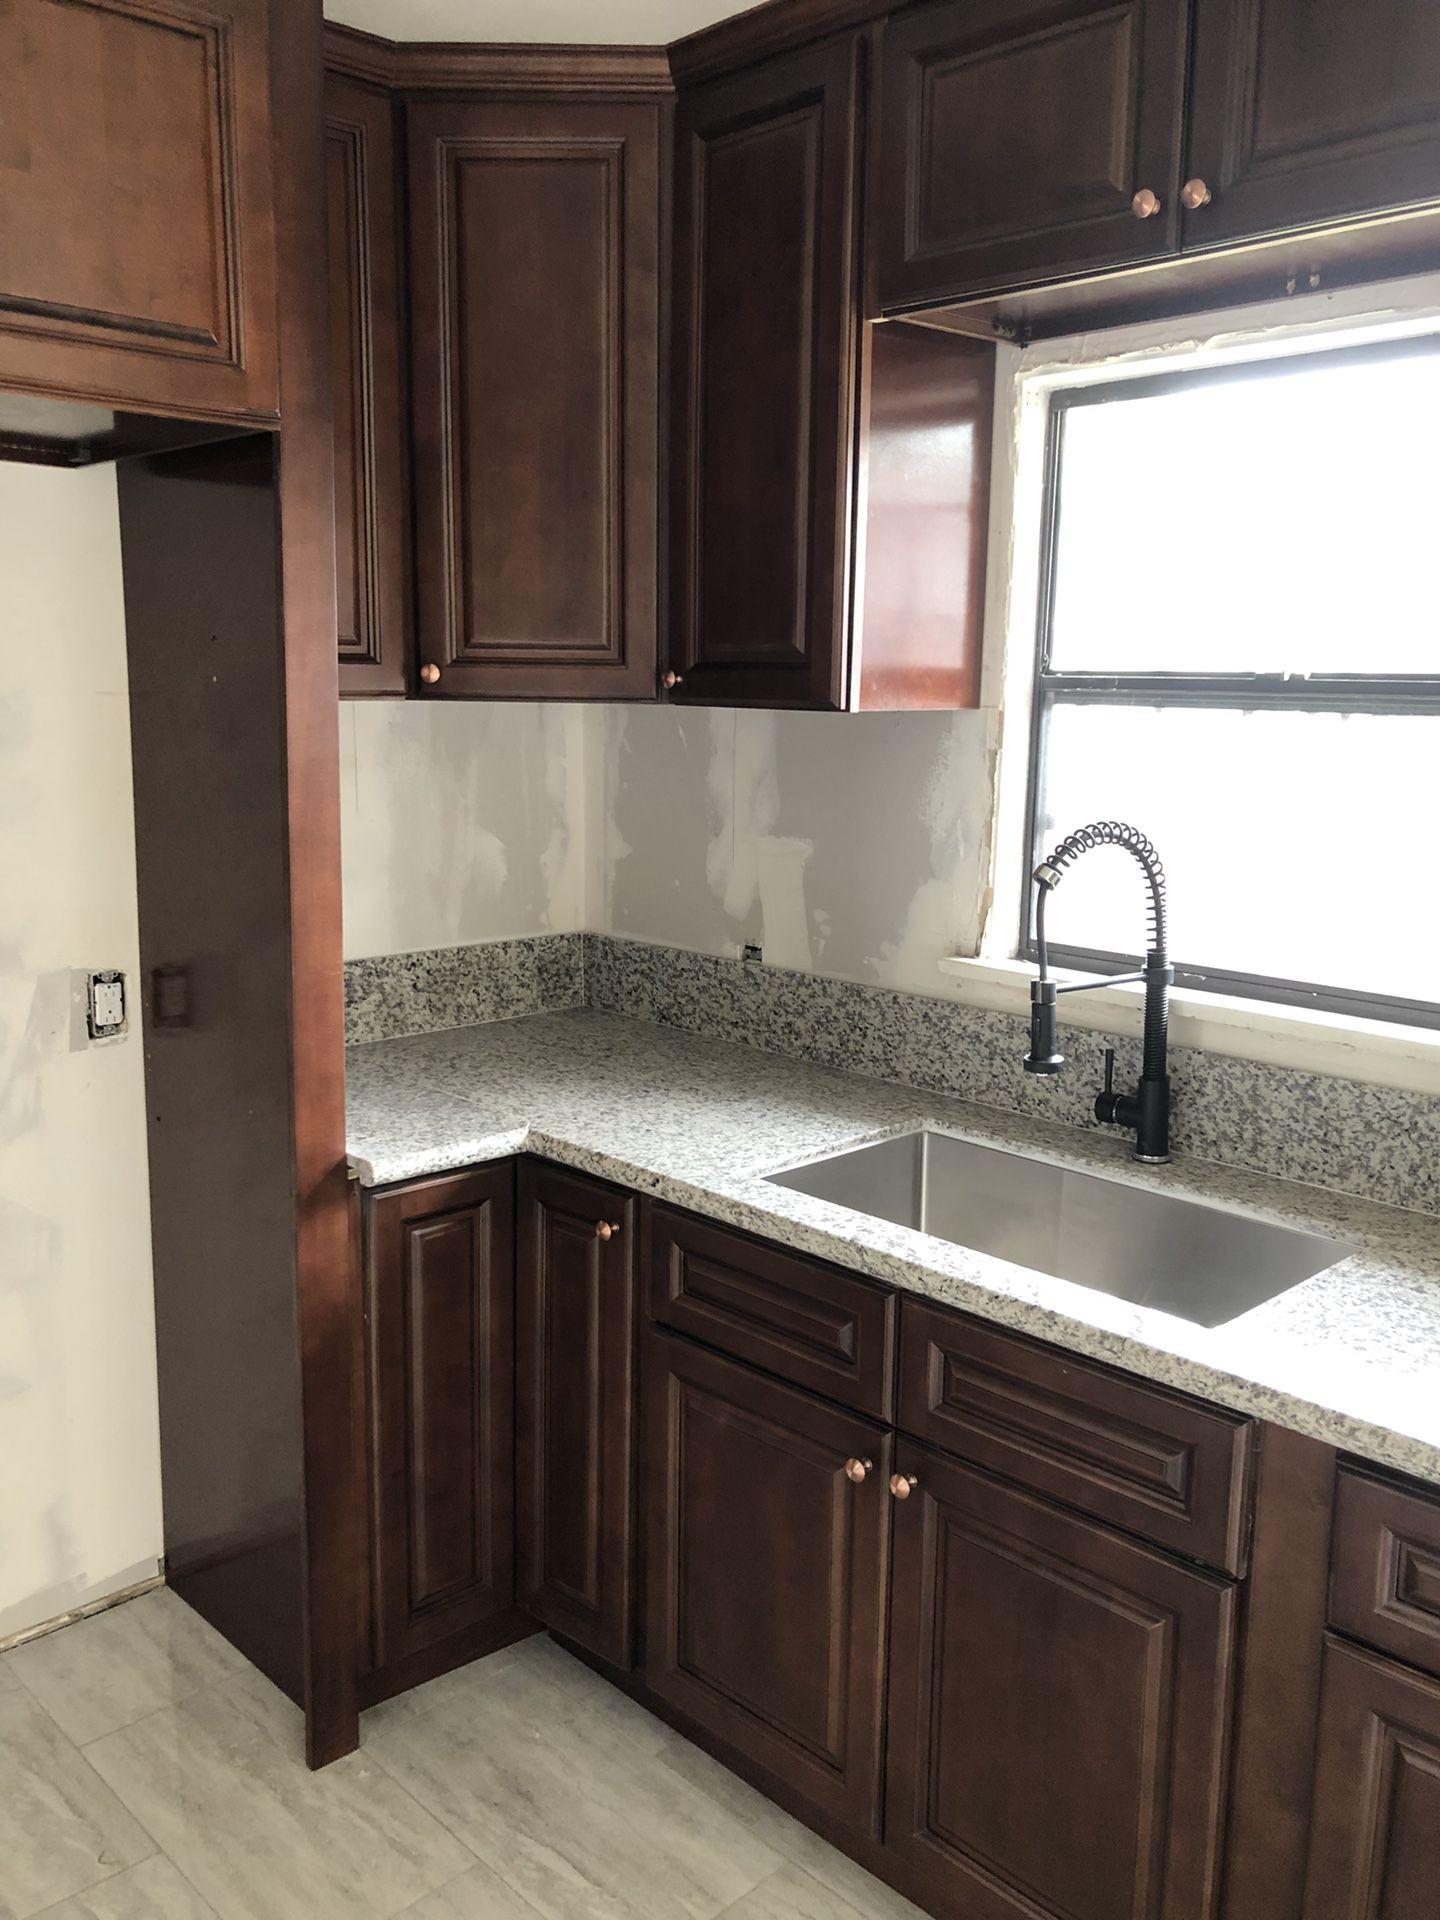 Cabinets, granite and quartz